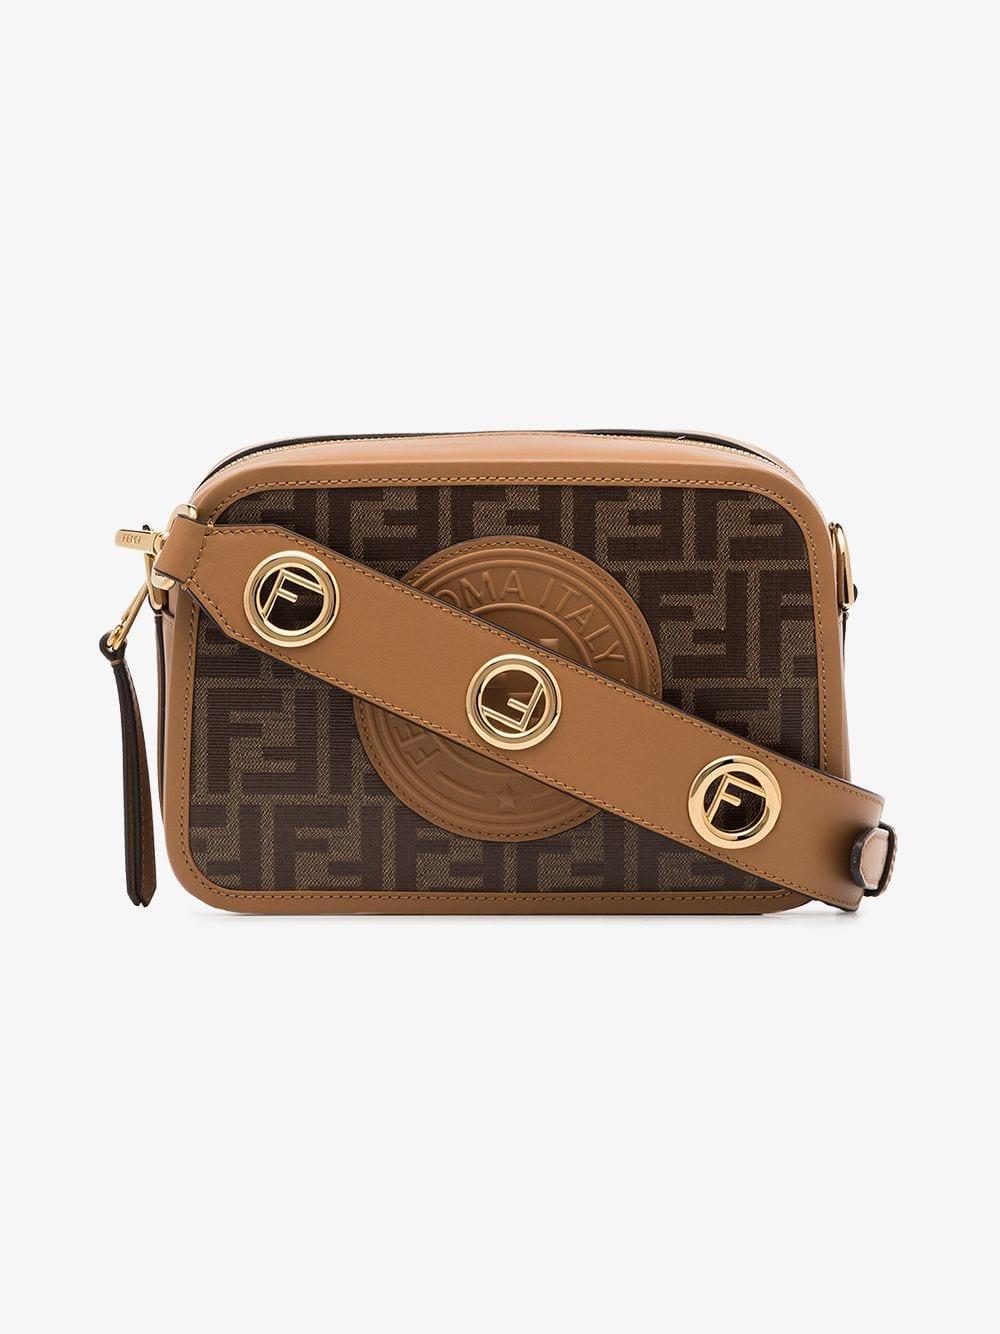 be7ce063b045 Fendi Camera Case Shoulder Bag in Brown - Lyst